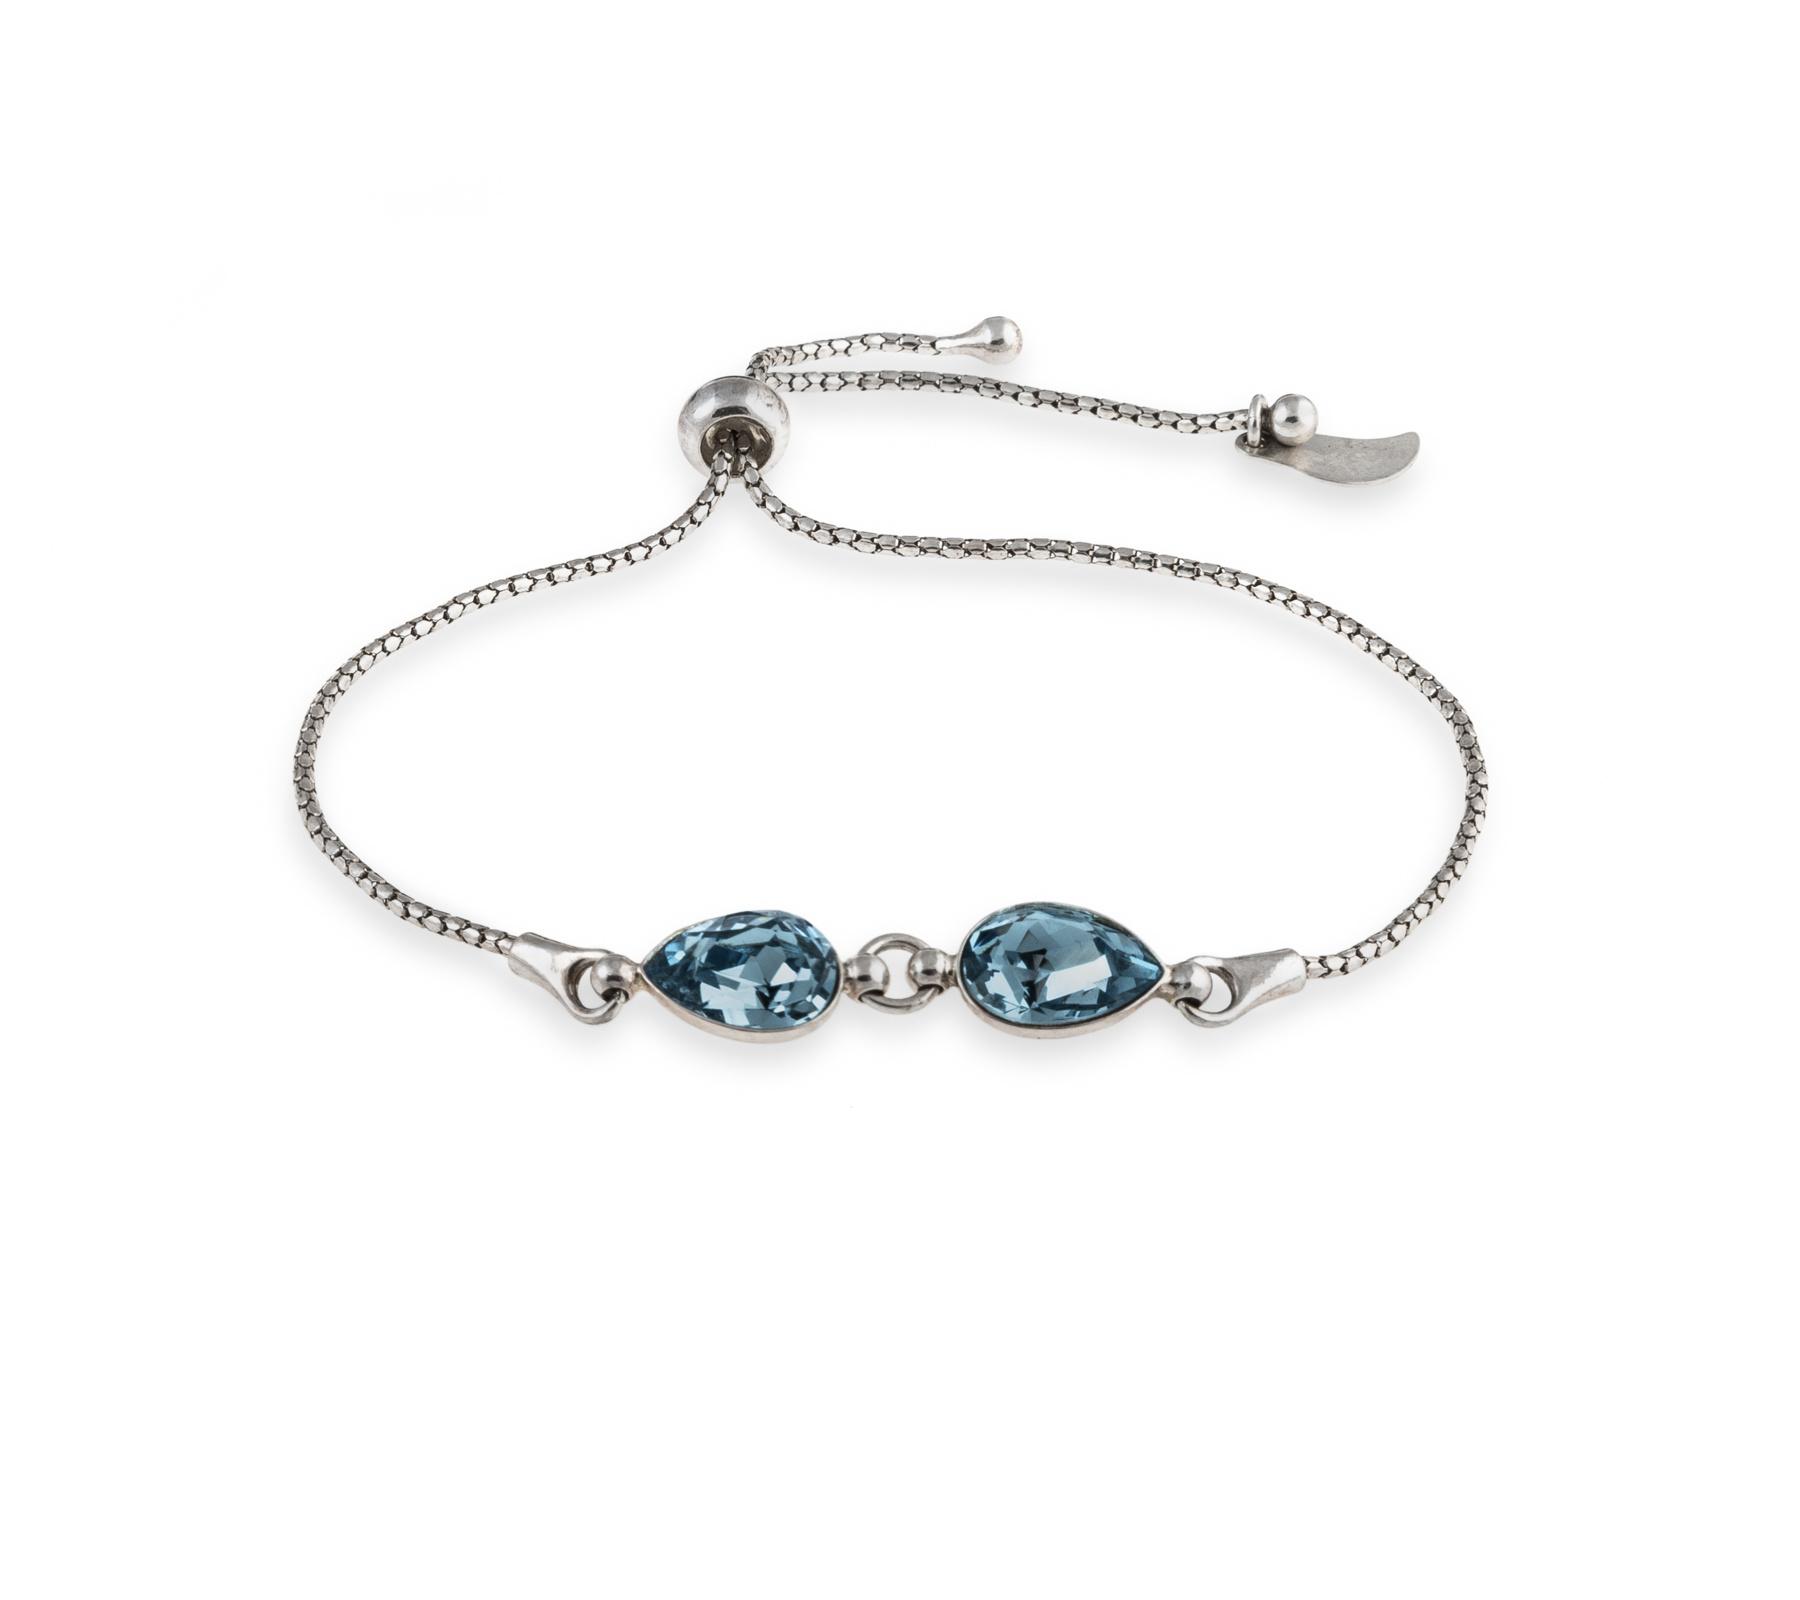 Bracelet with Swarovski crystals-1